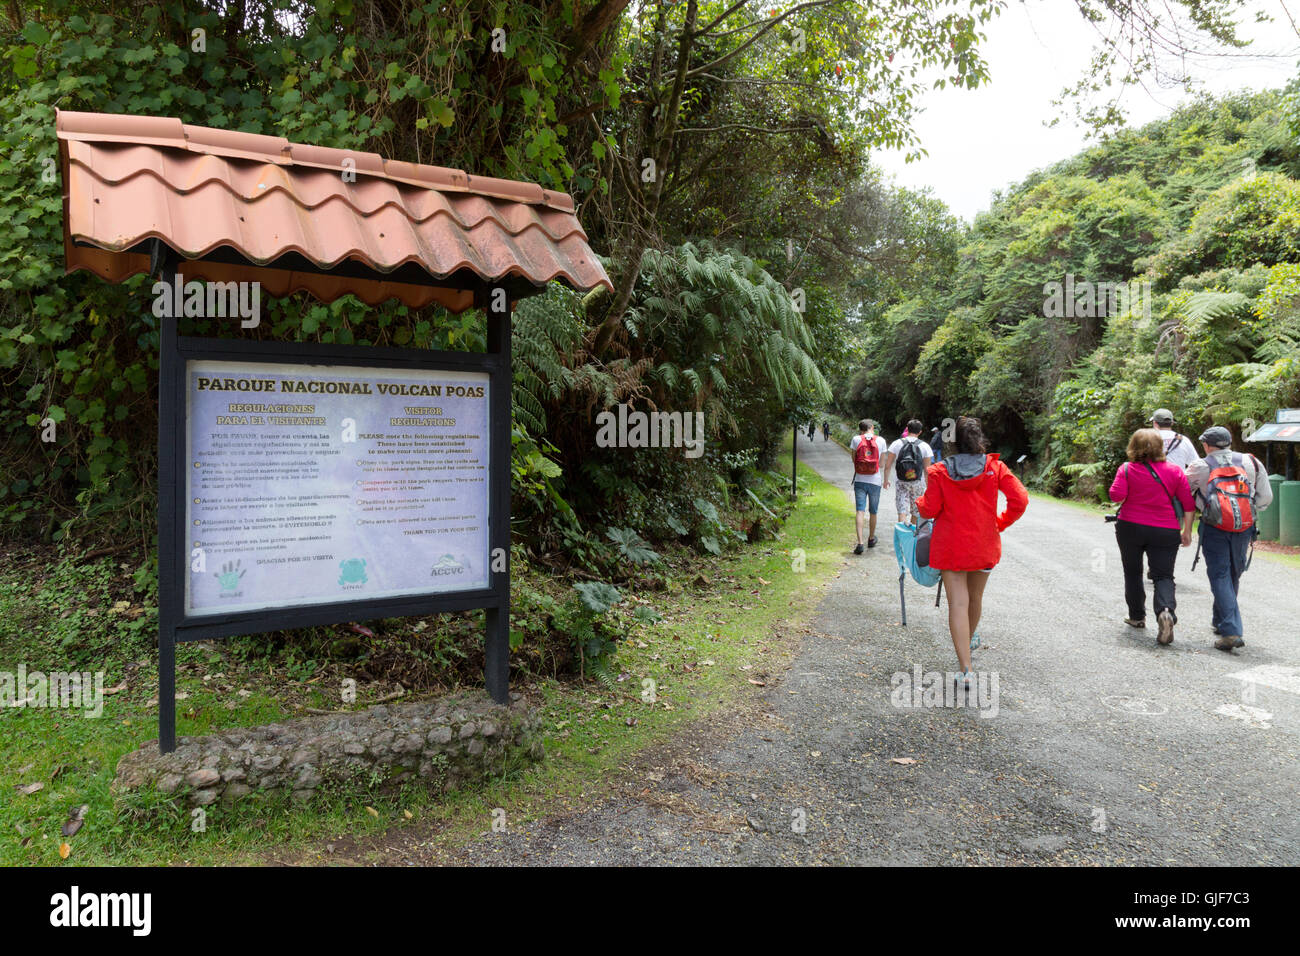 Tourists entering Poas Volcano national park, ( Parque Nacional Volcan Poas ), Costa Rica, Central America - Stock Image